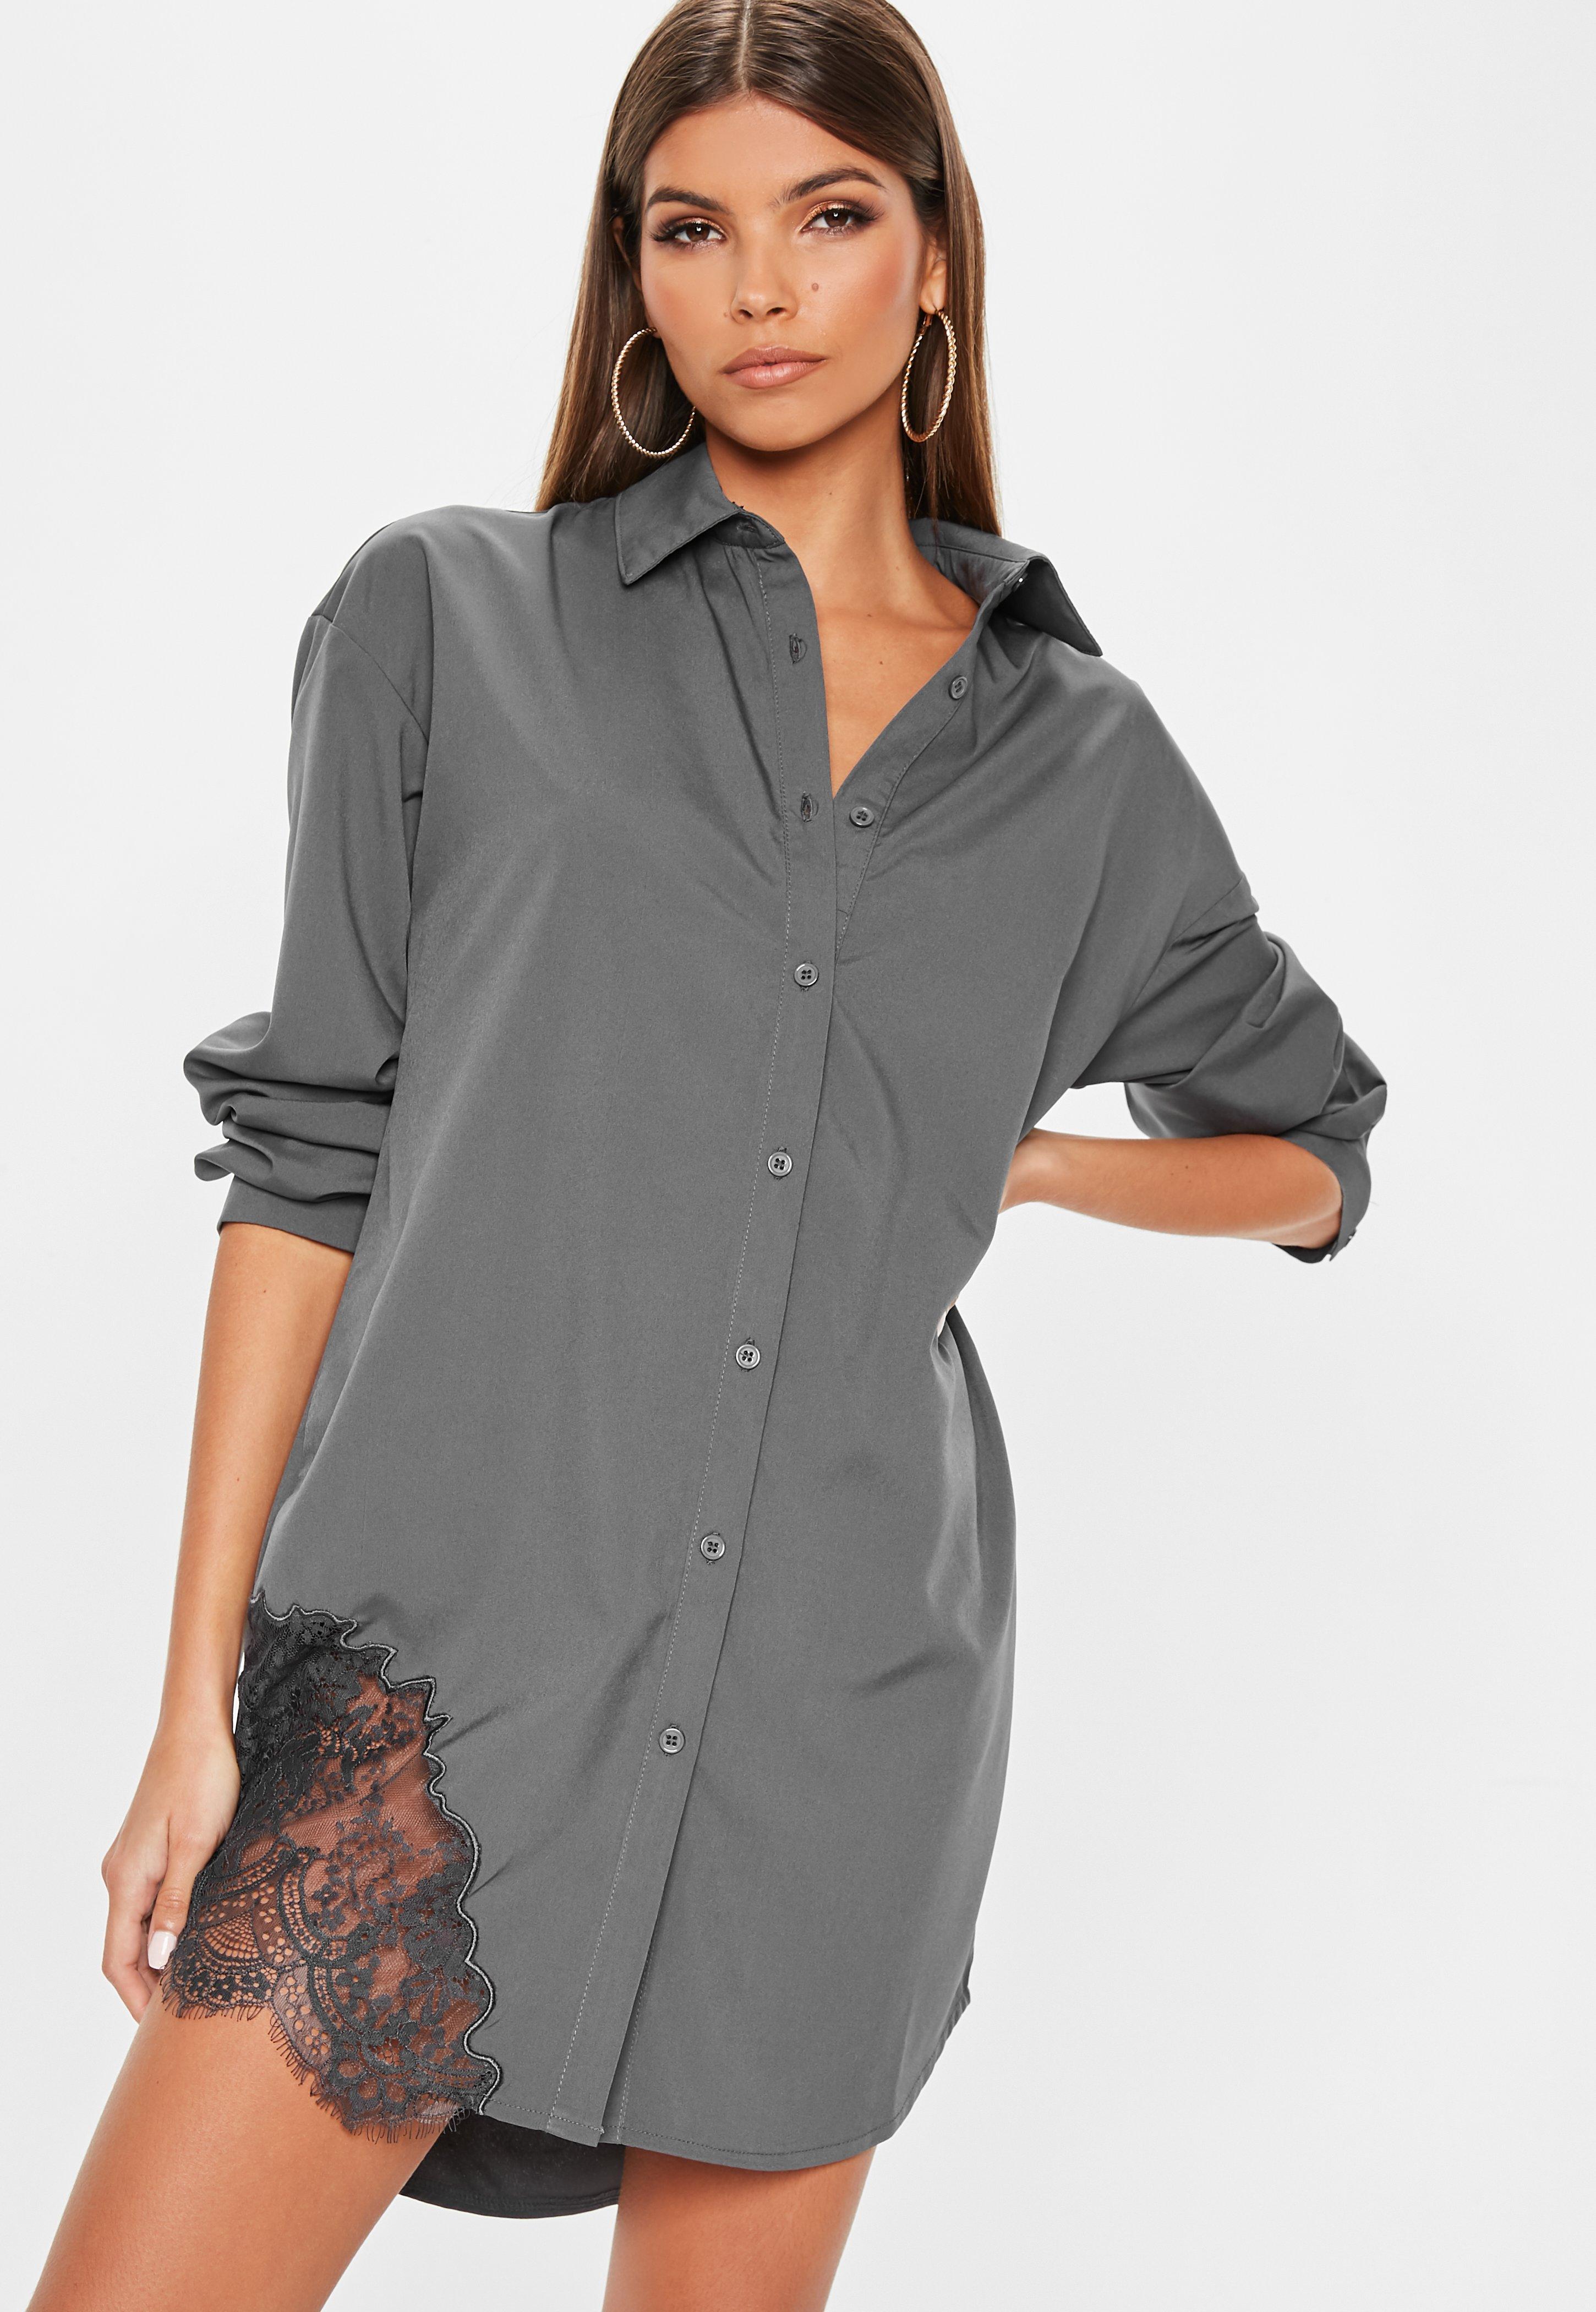 b1578a1466cb Grey Lace Trim Shirt Dress